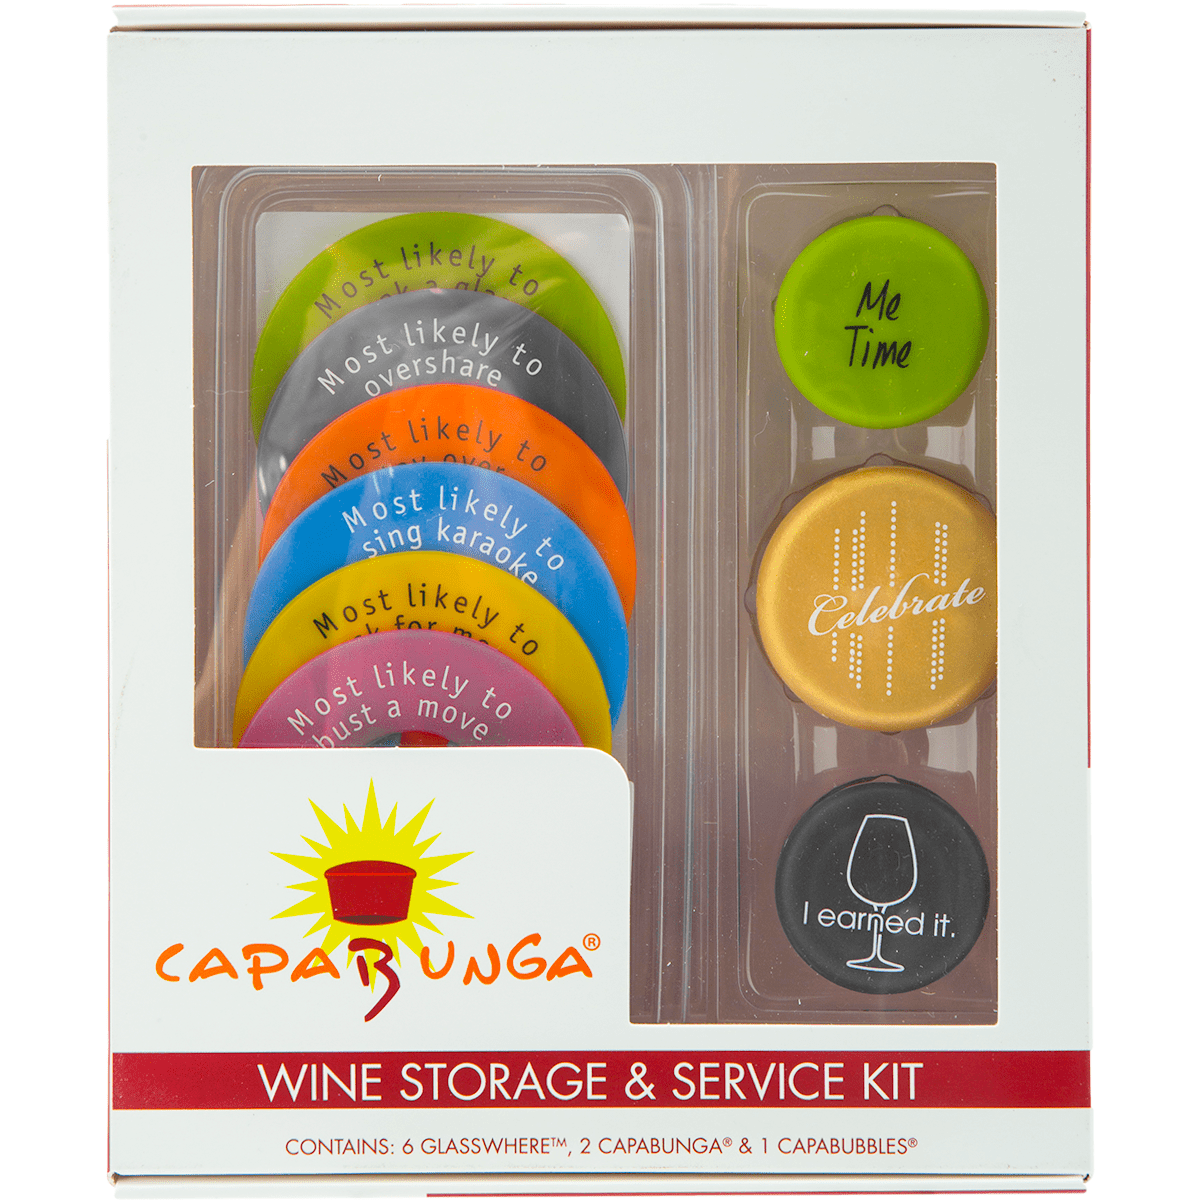 Capabunga Wine Storage And Service Kit - Slogans